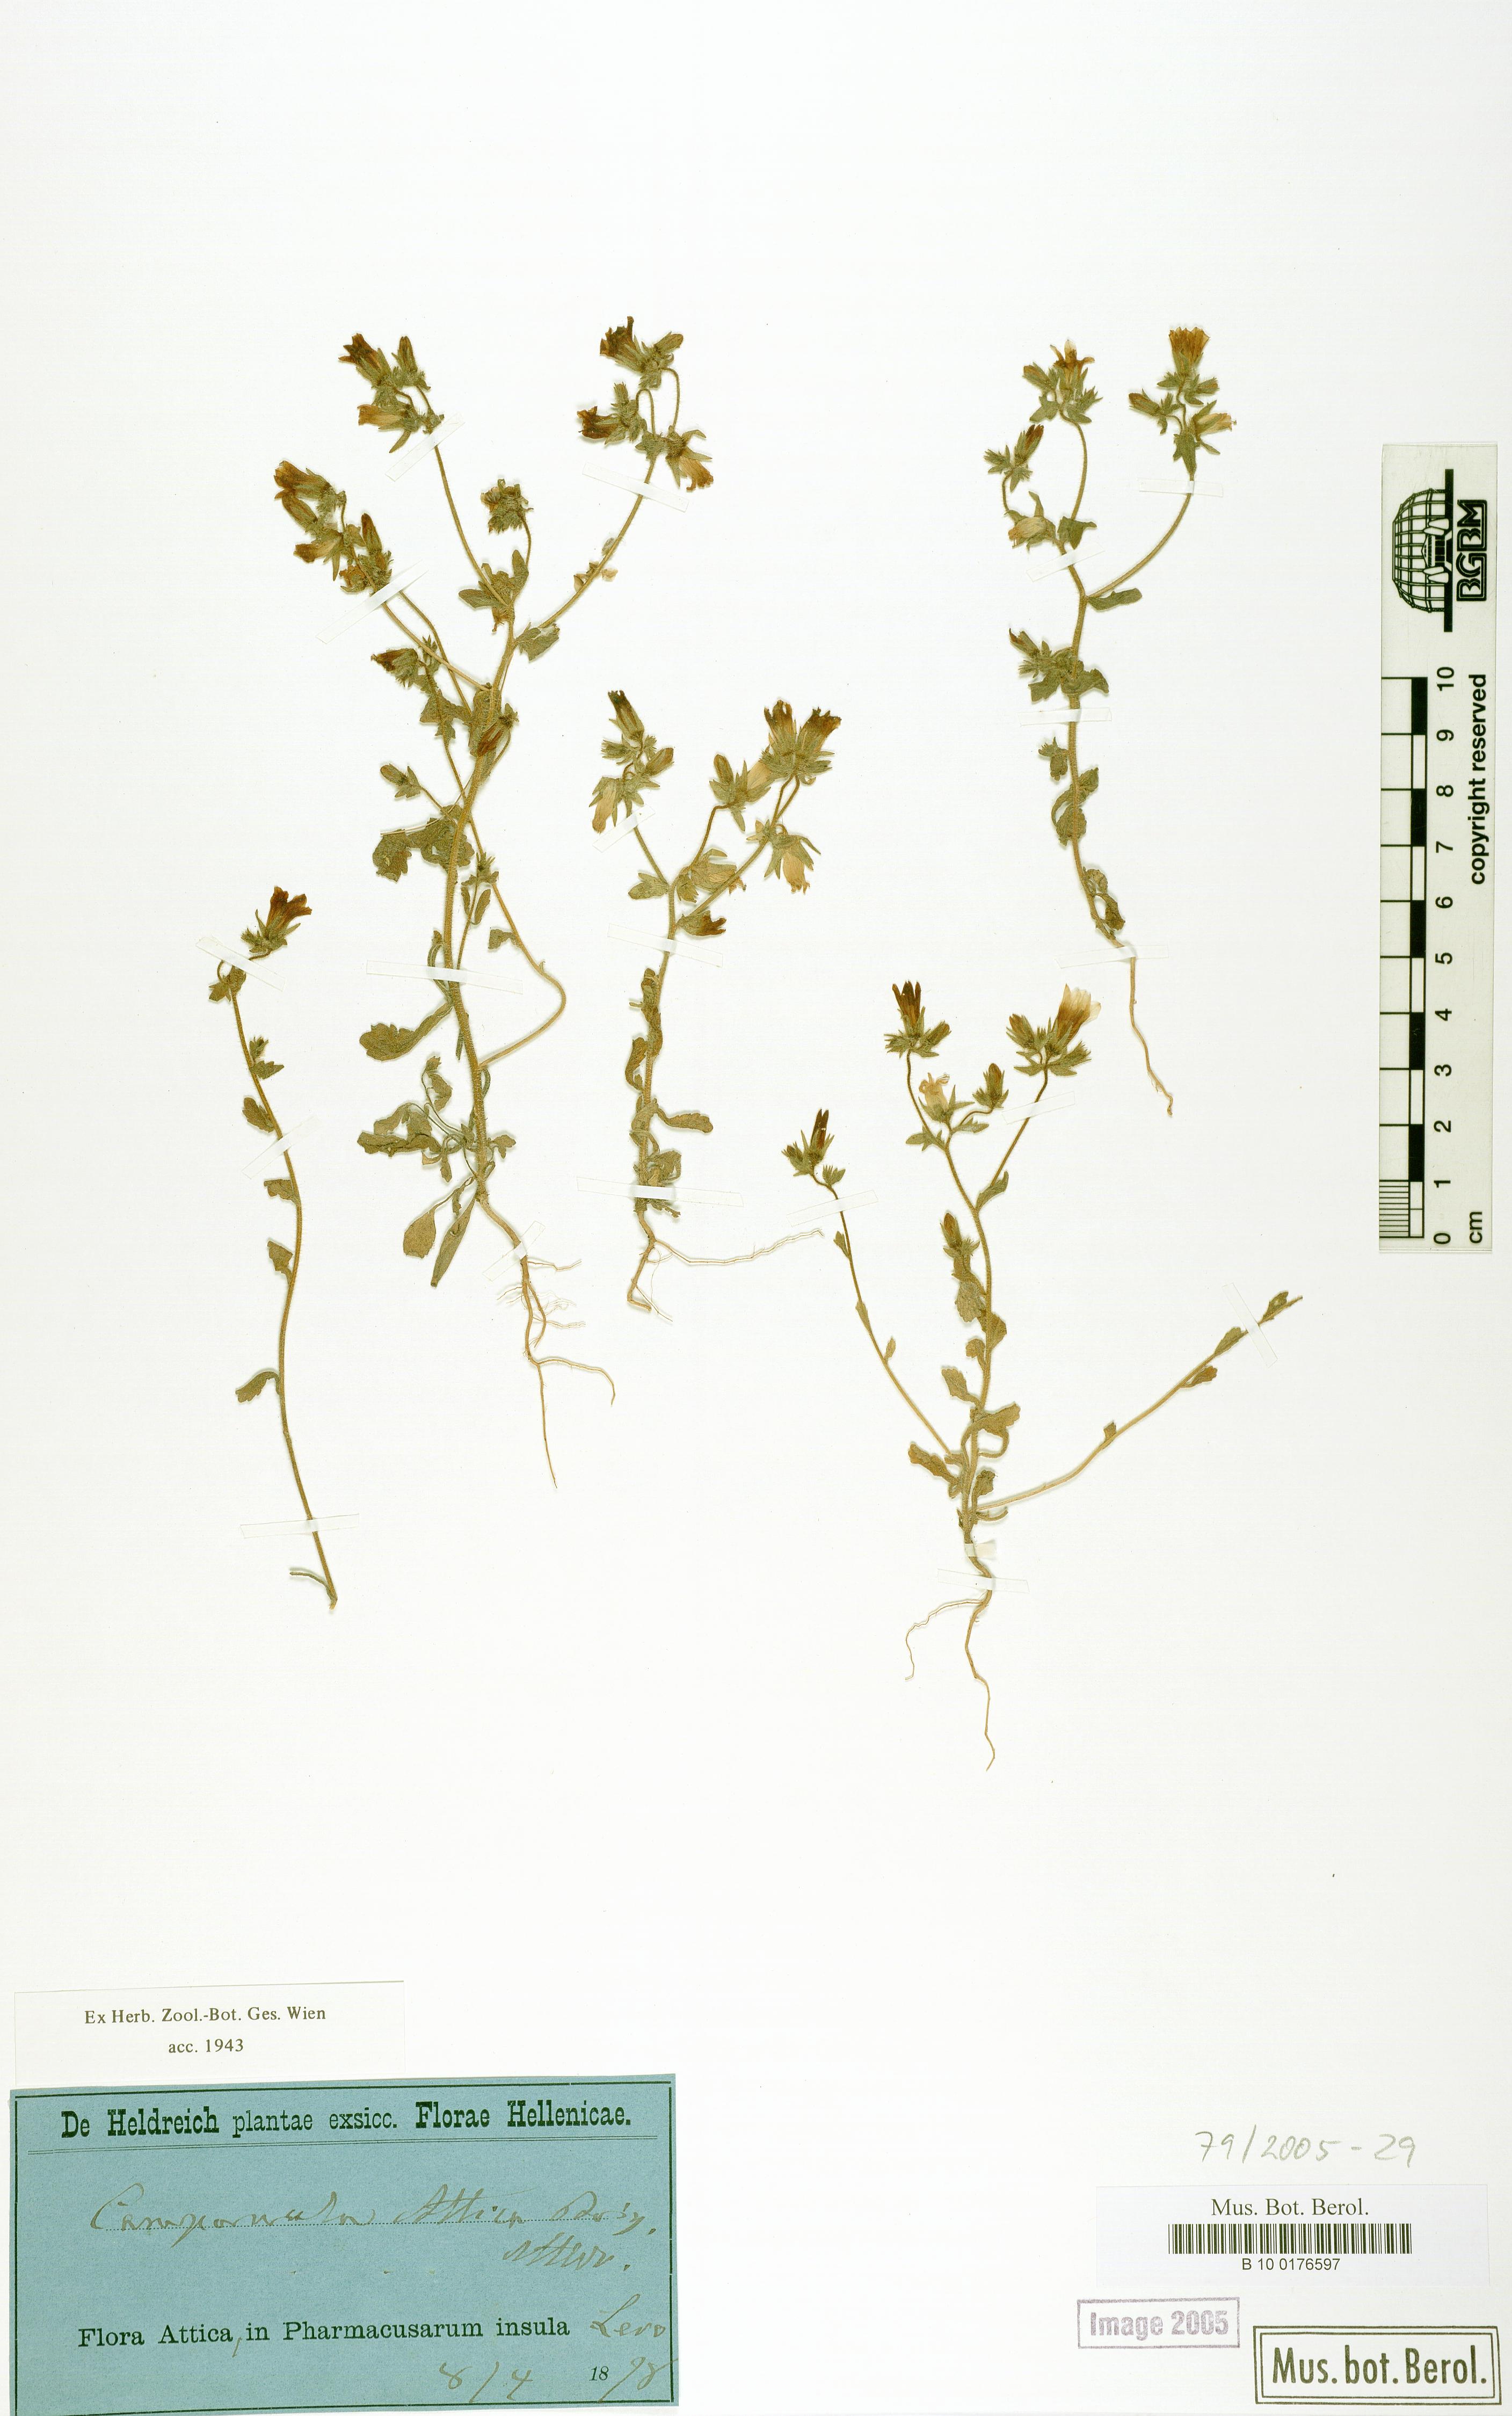 http://ww2.bgbm.org/herbarium/images/B/10/01/76/59/B_10_0176597.jpg